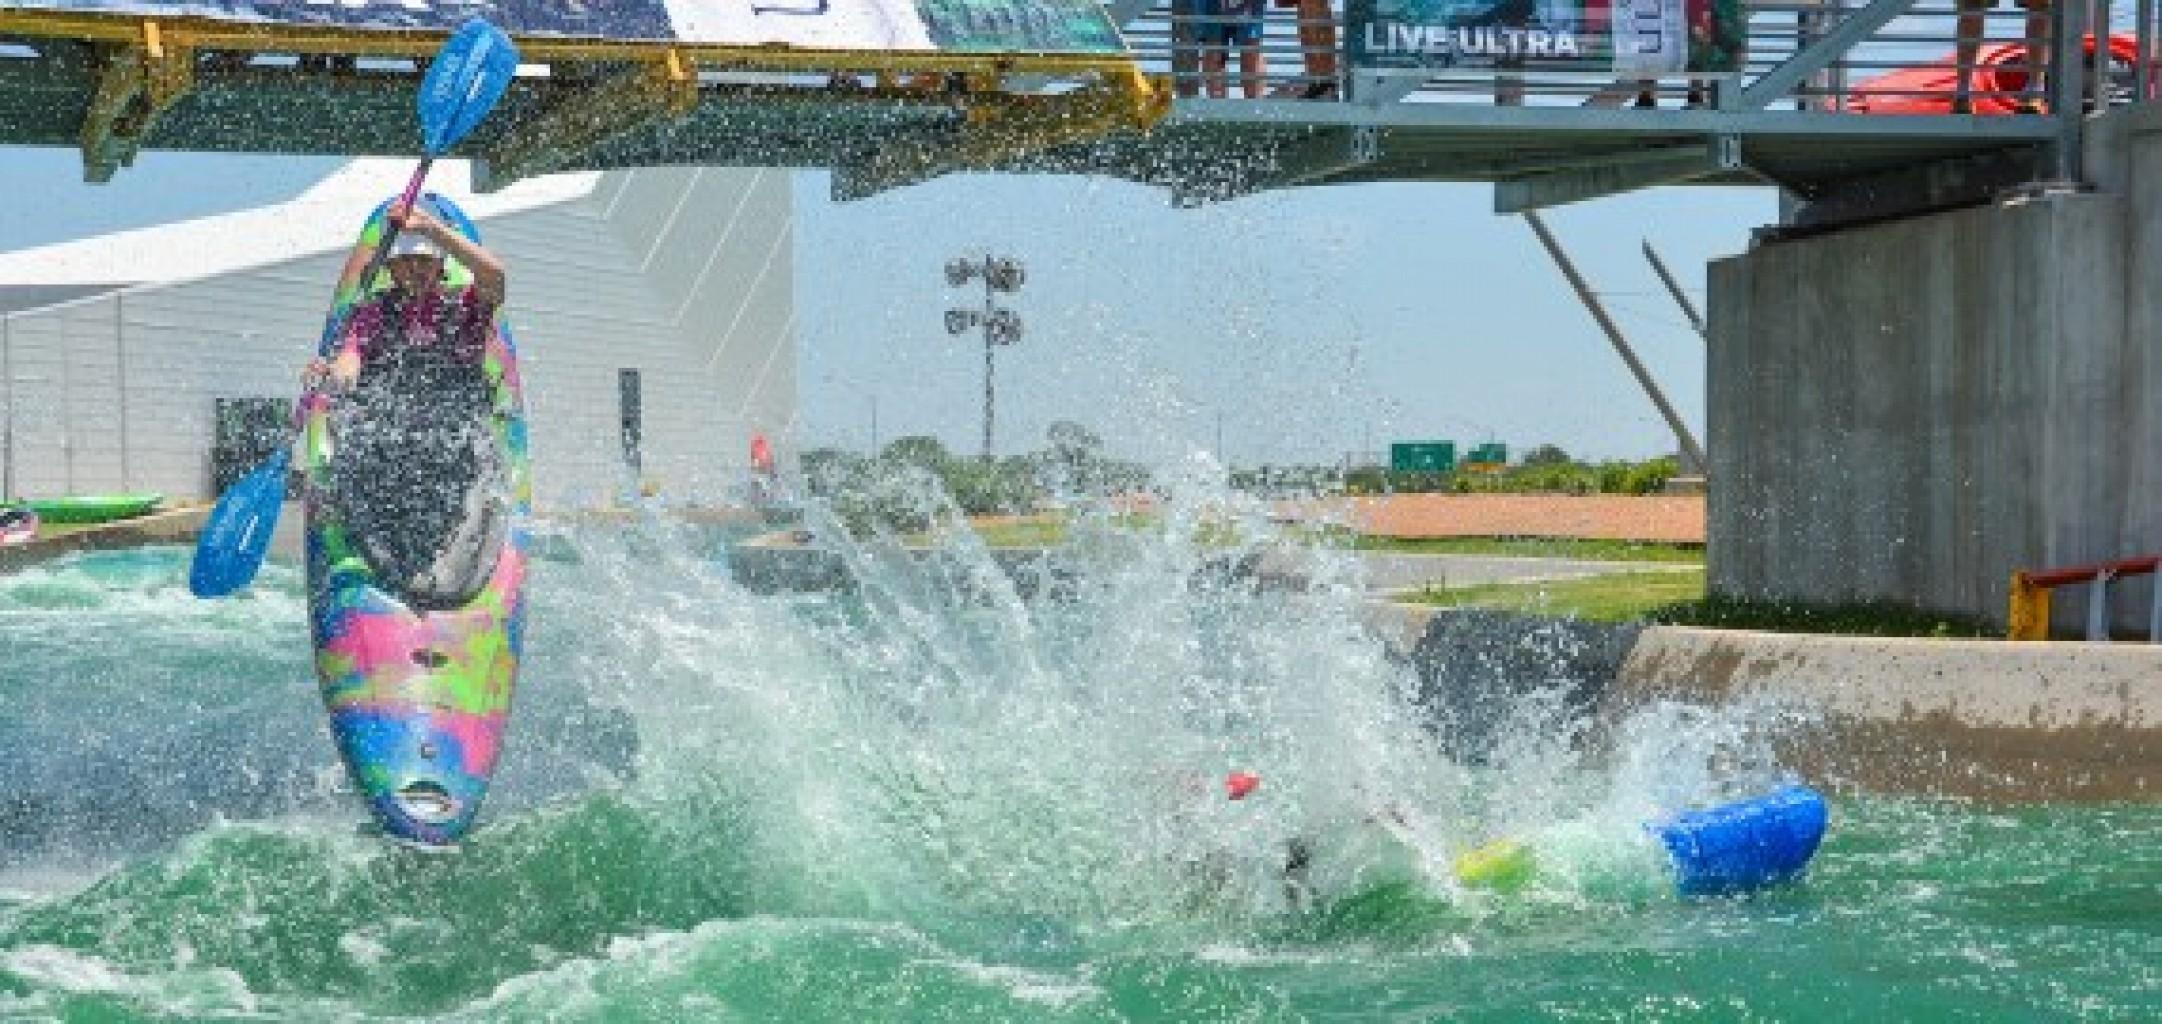 Oklahoma City Sede de la Supercopa de Canoa